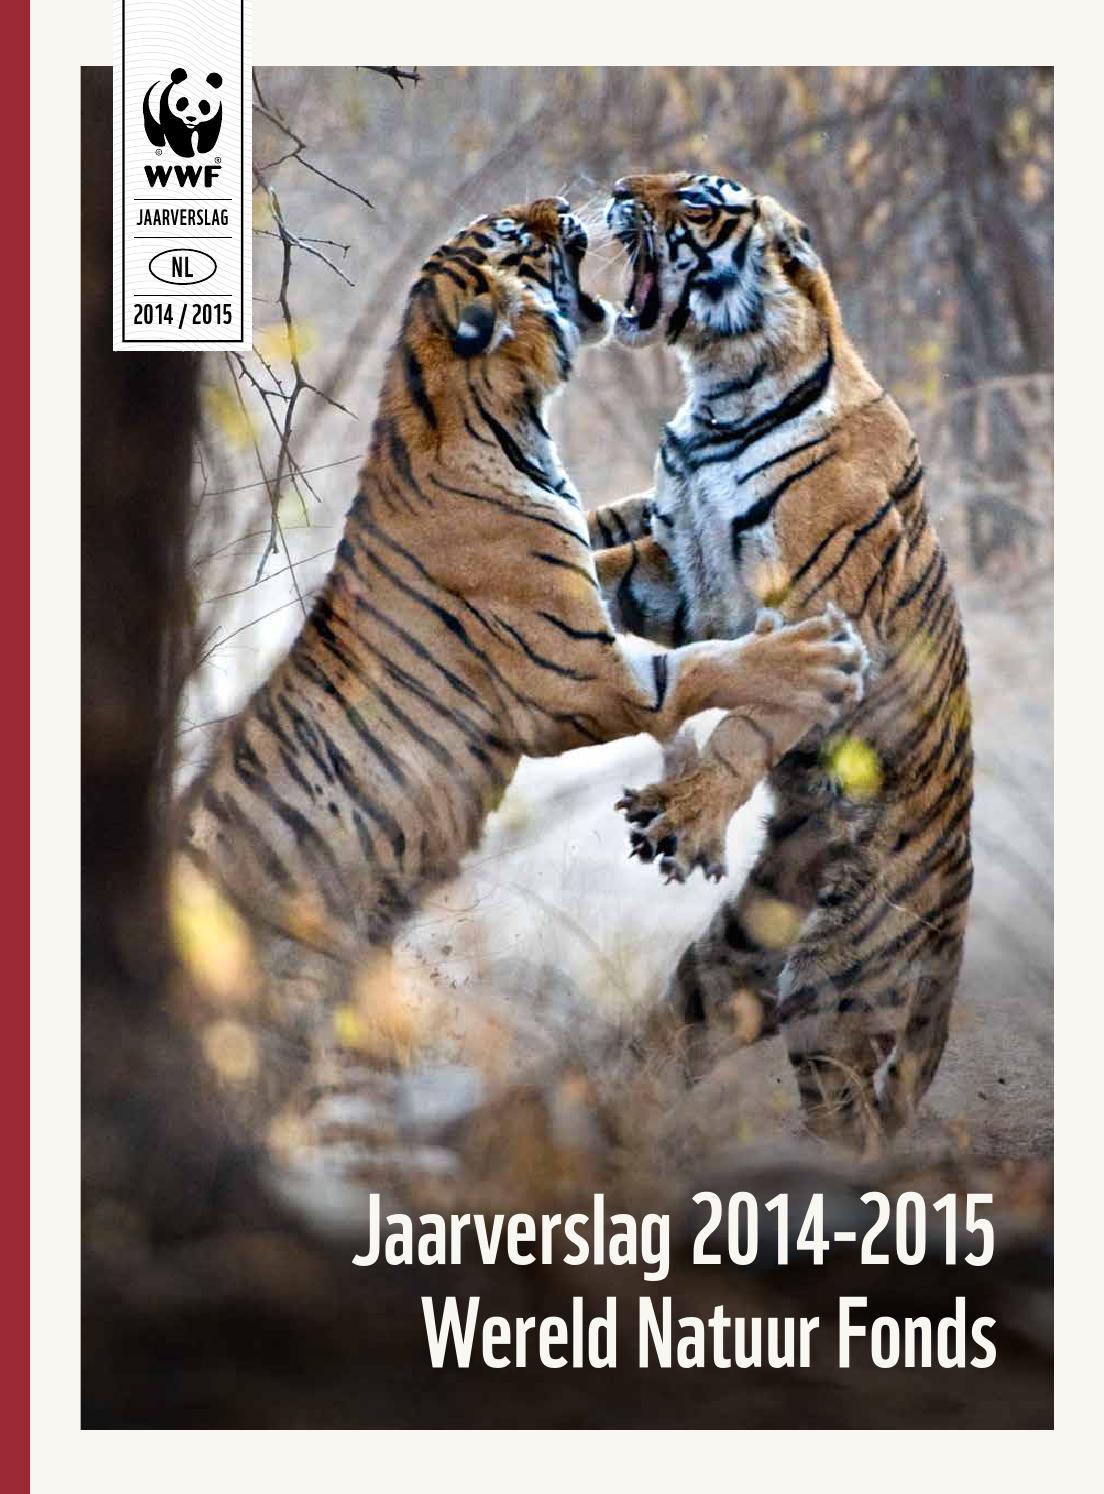 Jaarverslag WNF 2014   2015 by Wereld Natuur Fonds   issuu